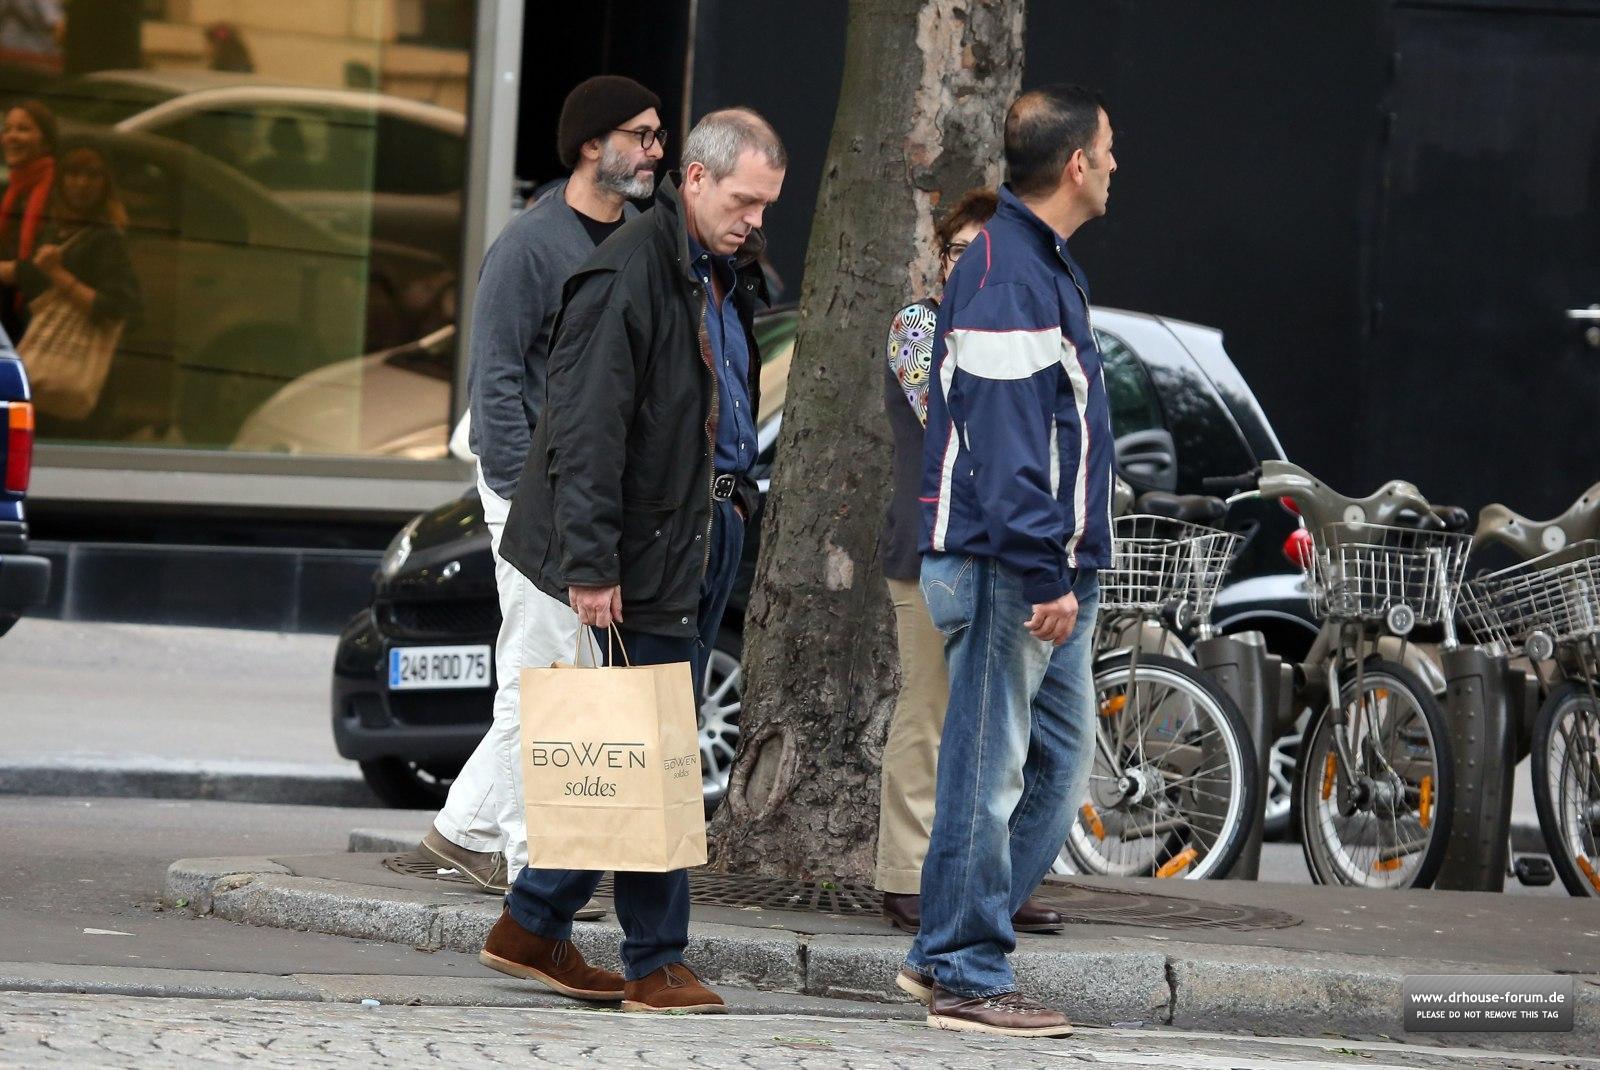 http://3.bp.blogspot.com/-Samm_h_jMwg/T_7gLw15gXI/AAAAAAAACYo/7iPVcaRHnO8/s1600/Hugh+Laurie+%2526+Jo+Green+-+Shopping+in+Paris+-+July+2012+(1).jpg